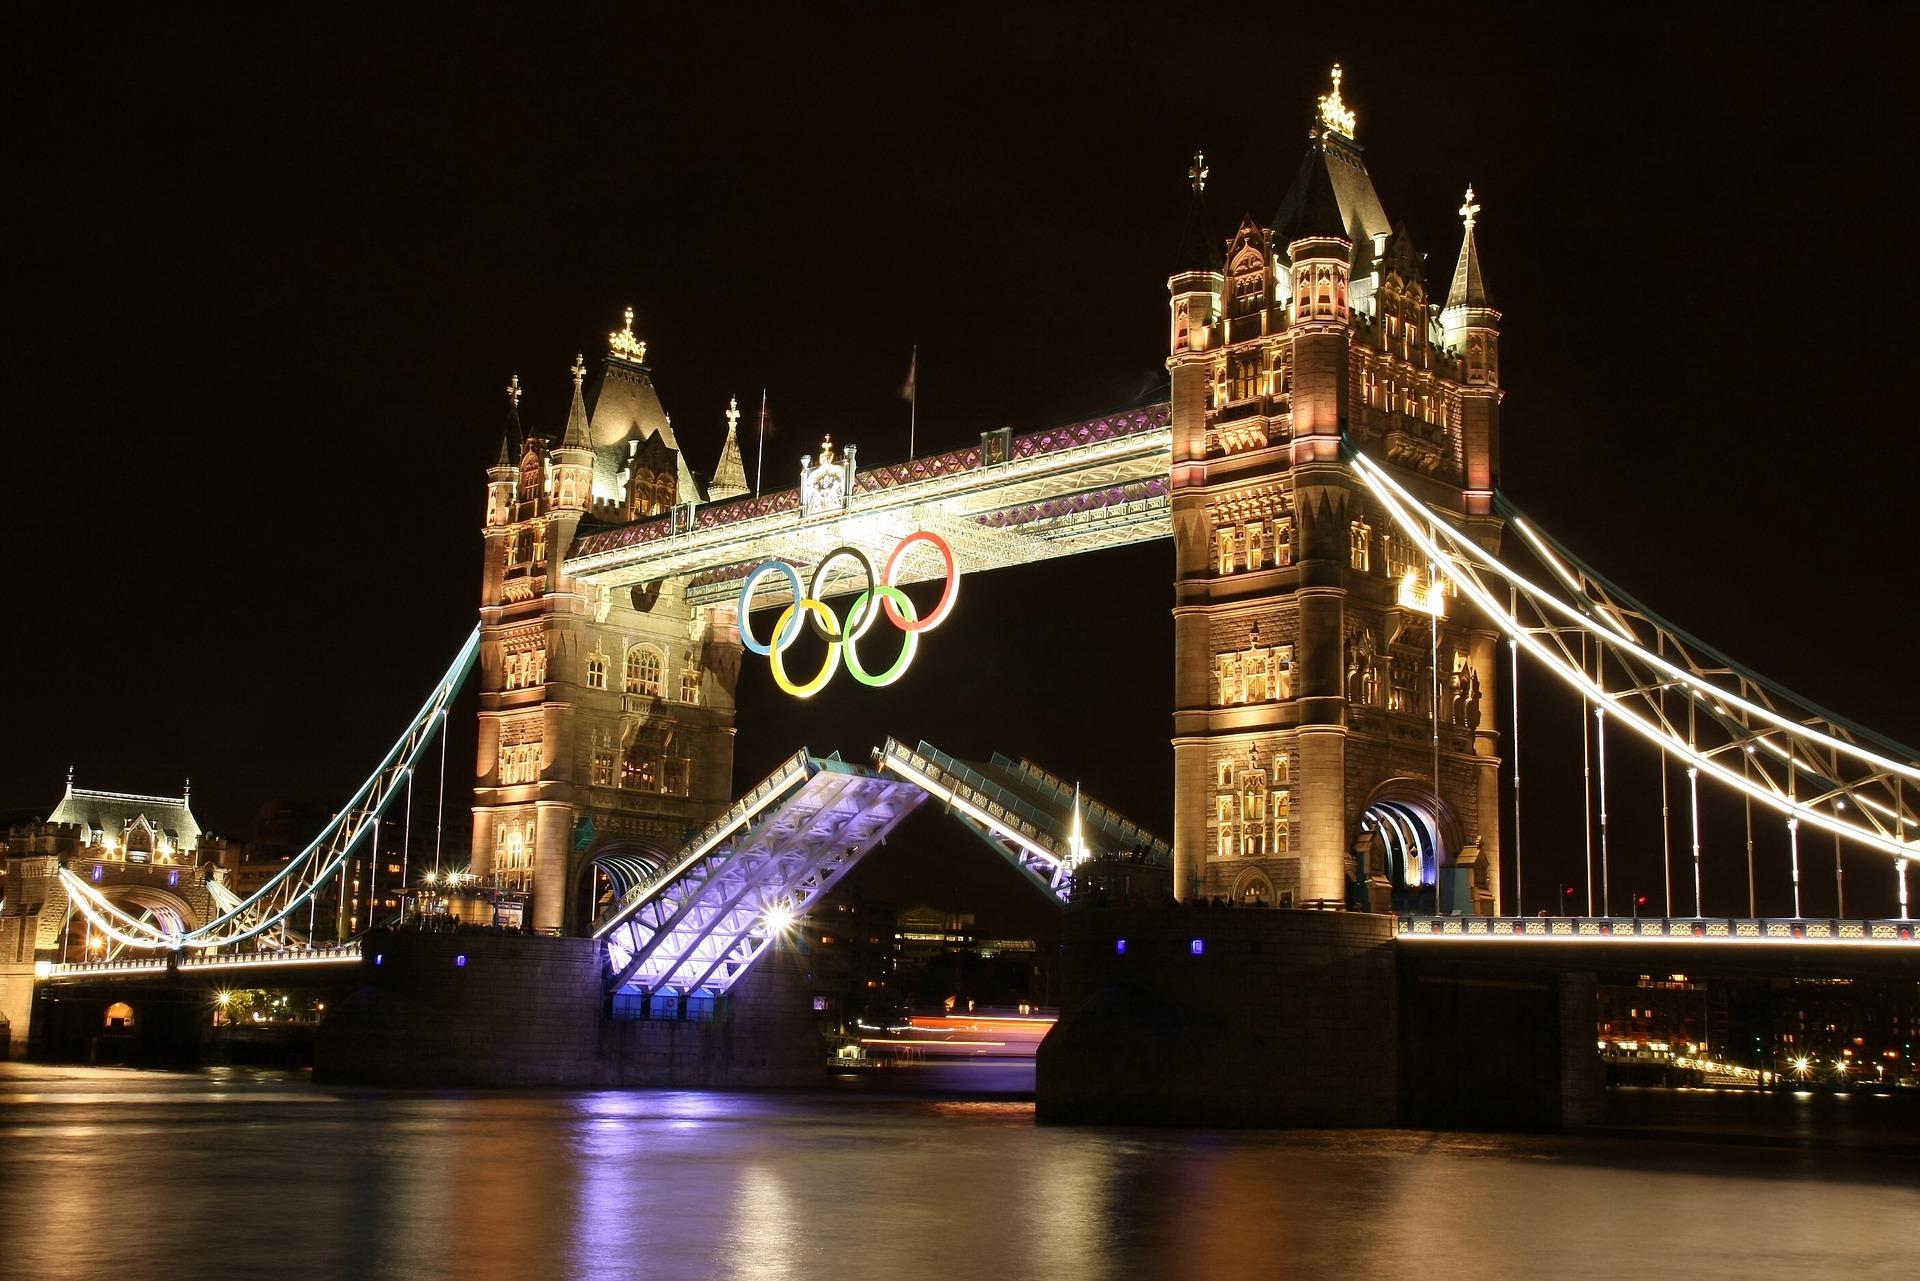 Olympics Tower Bridge London